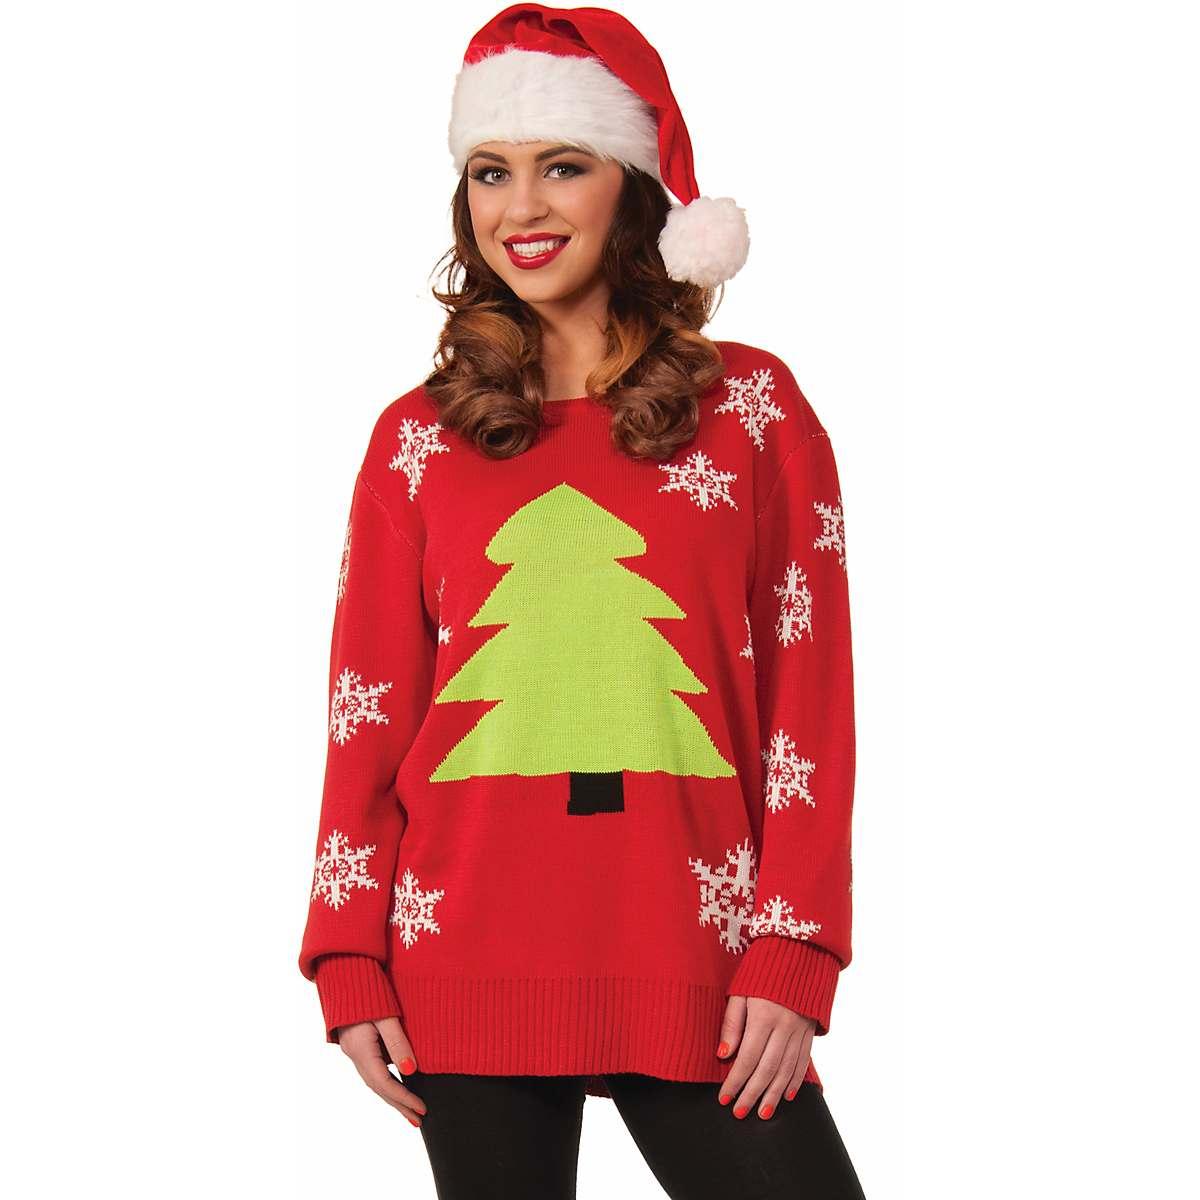 Christmas Whobilation sweater